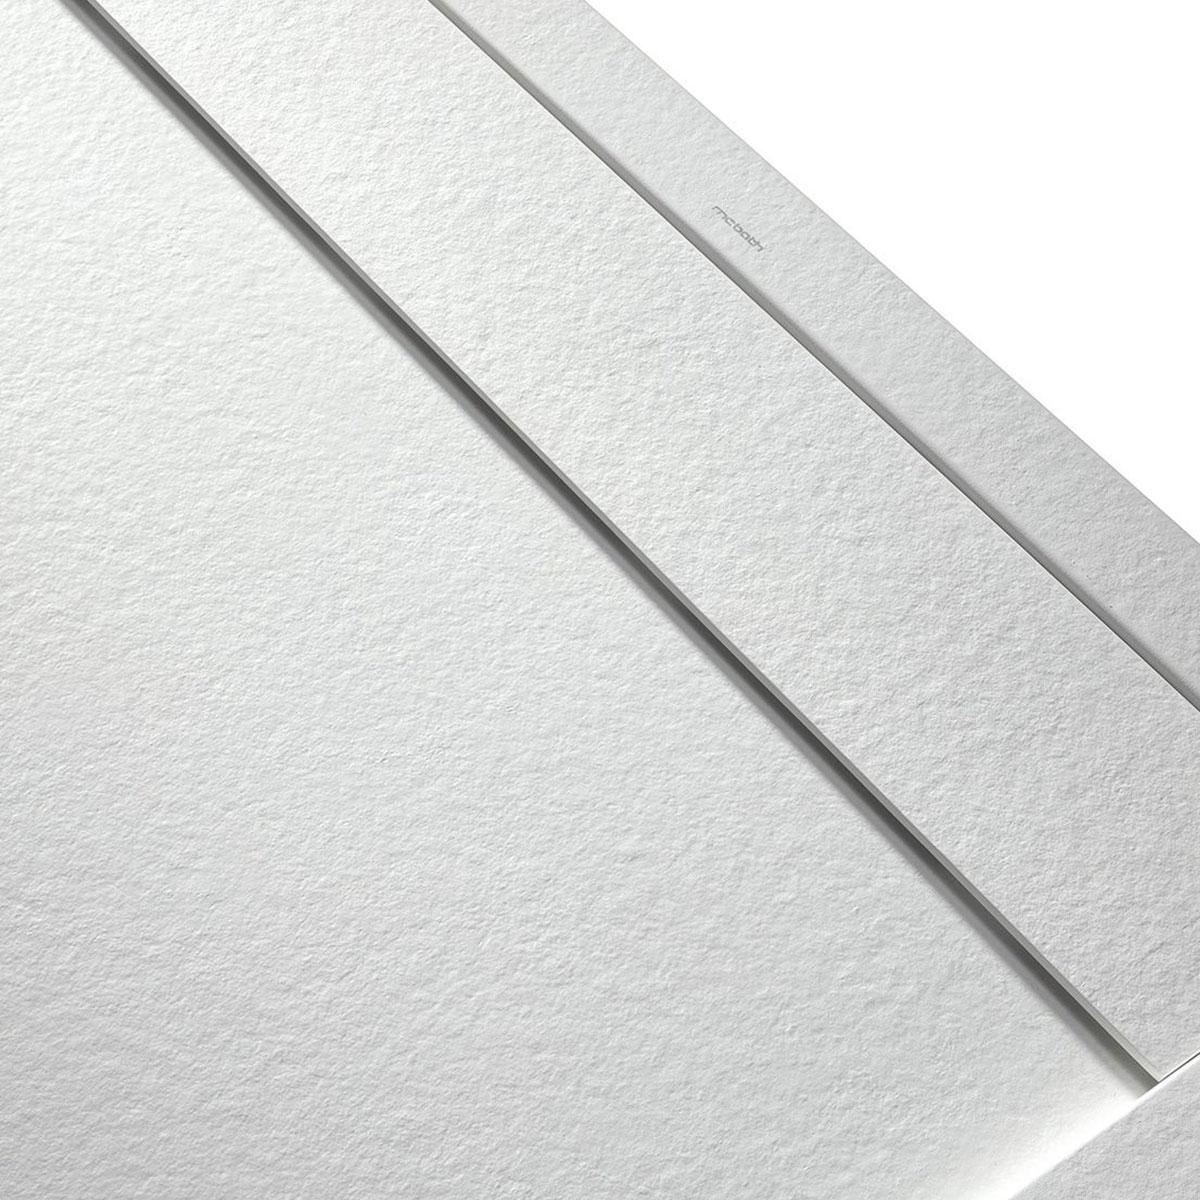 Plato de ducha rectangular 120x80 Andrómeda Stone Cover Perla